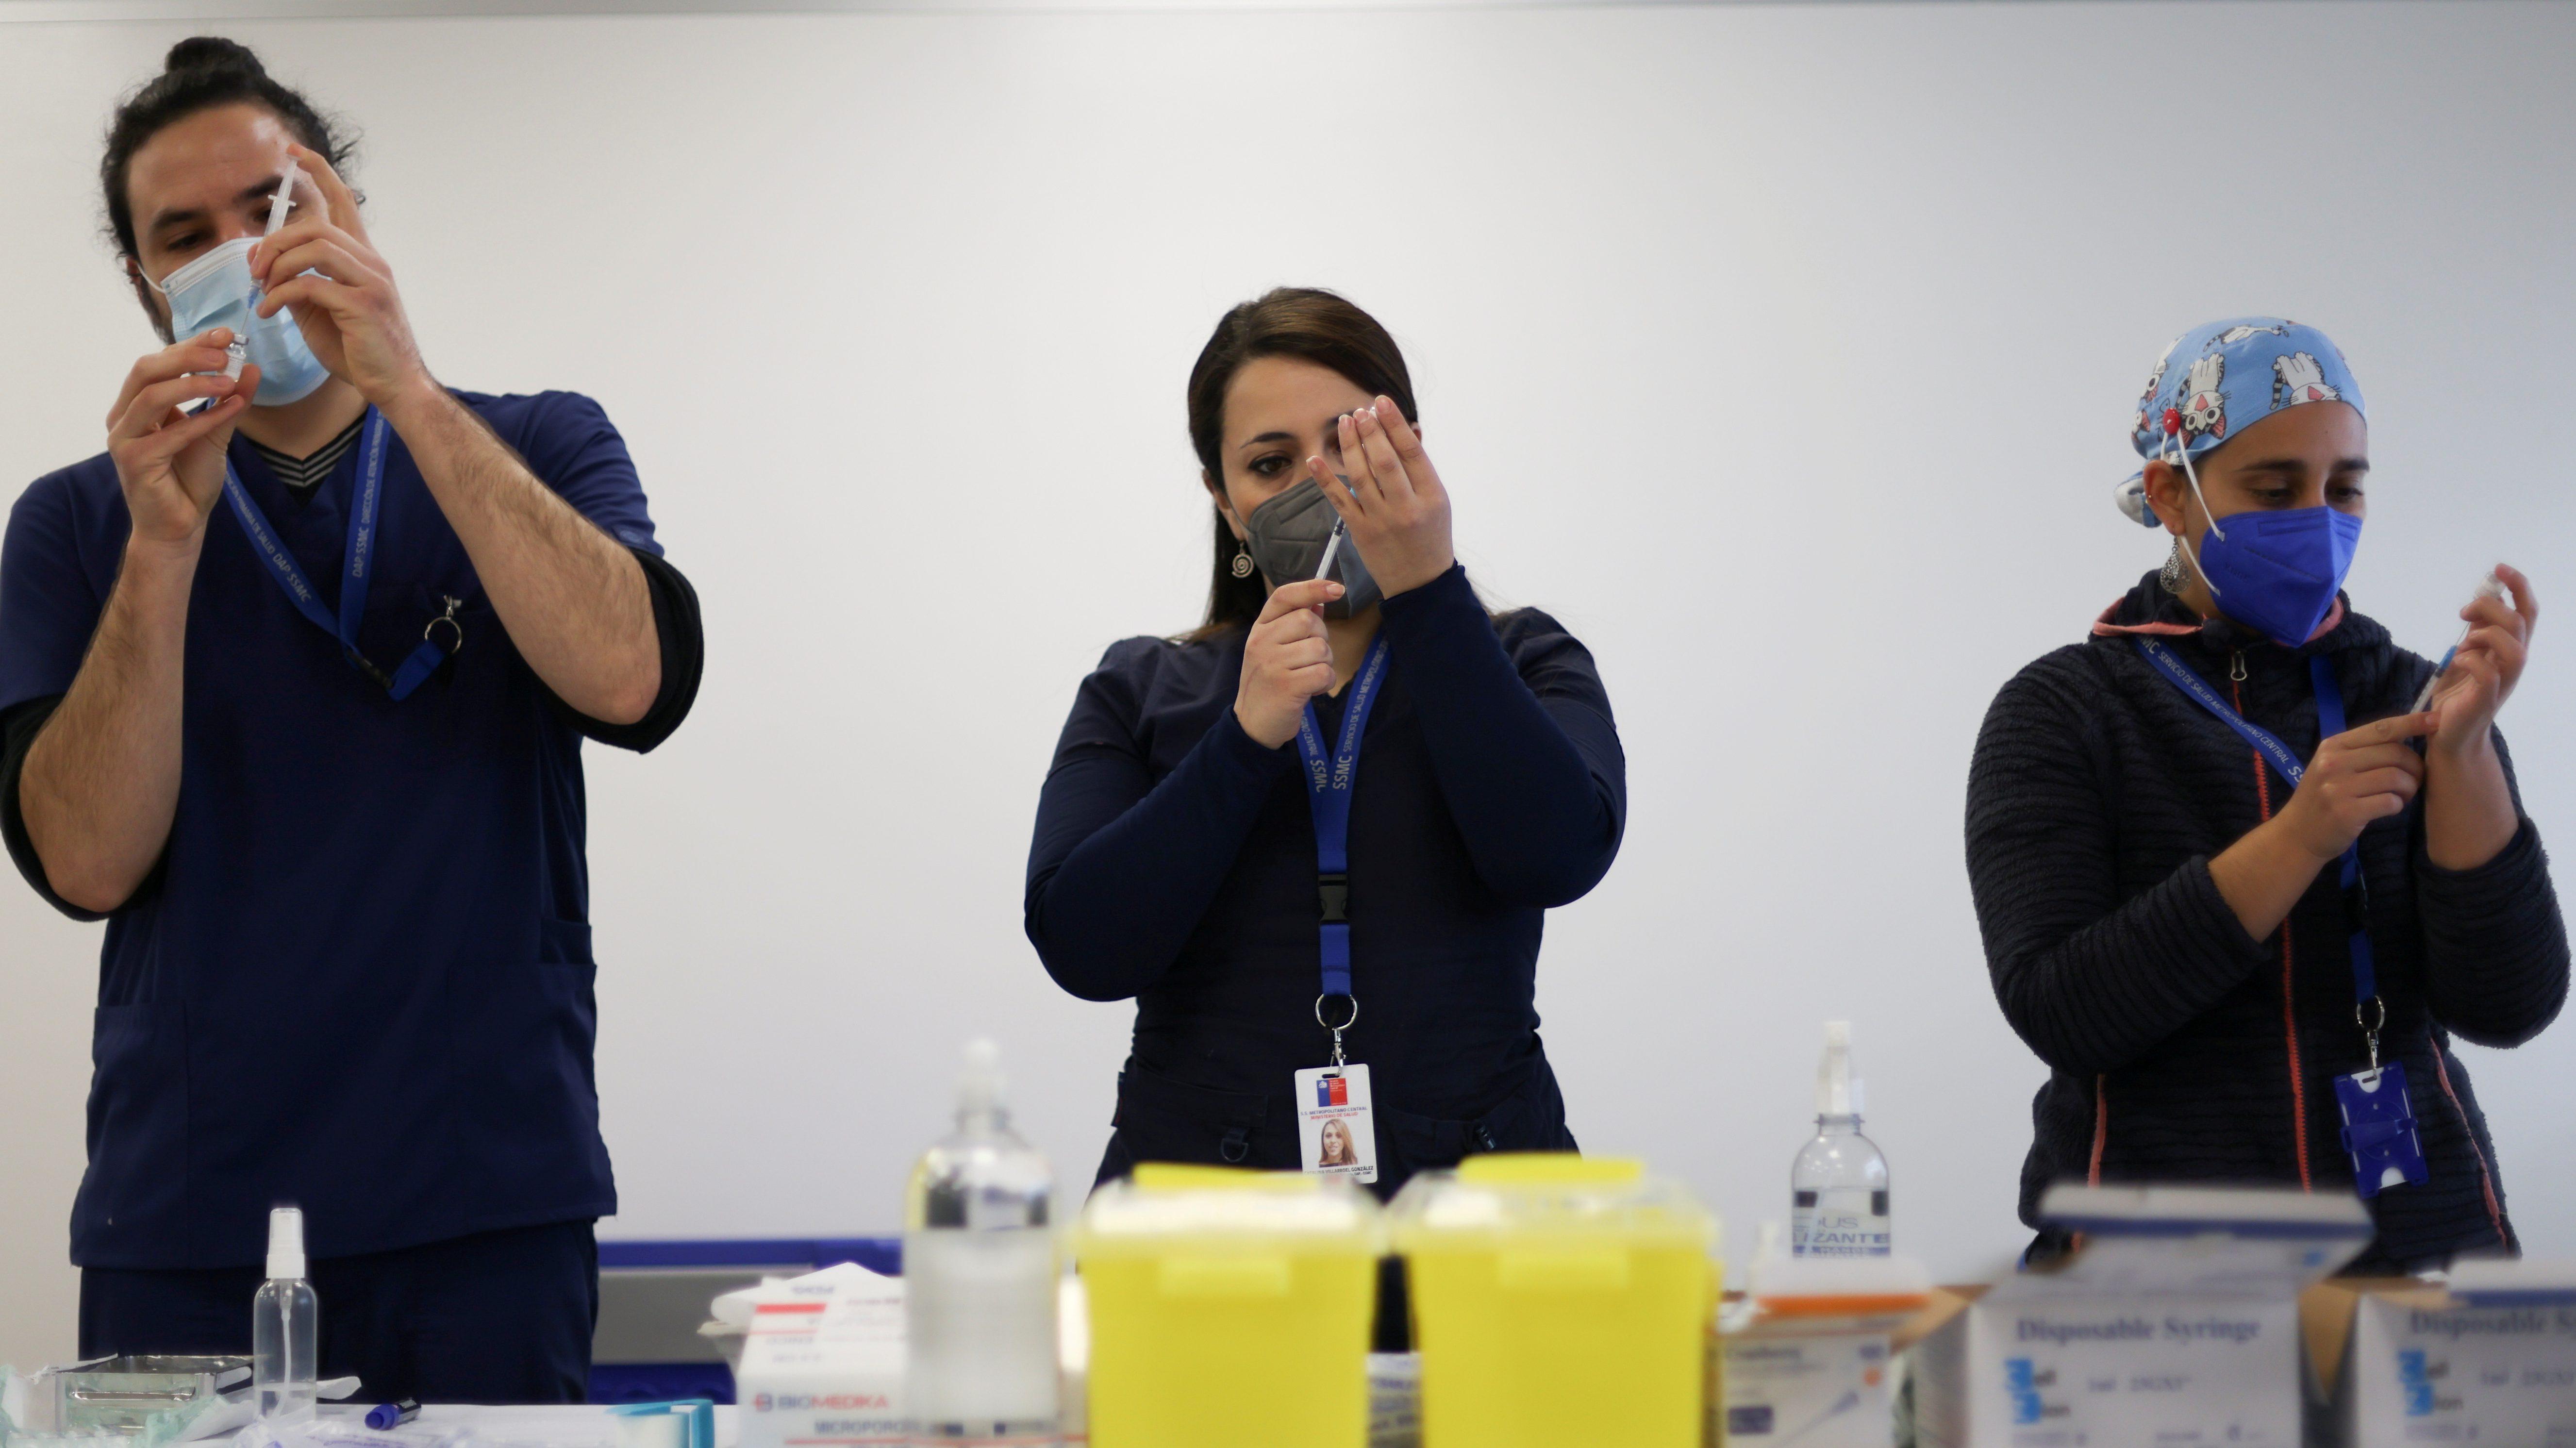 Healthcare workers prepare doses of Pfizer/BioNTech coronavirus disease (COVID-19) vaccines